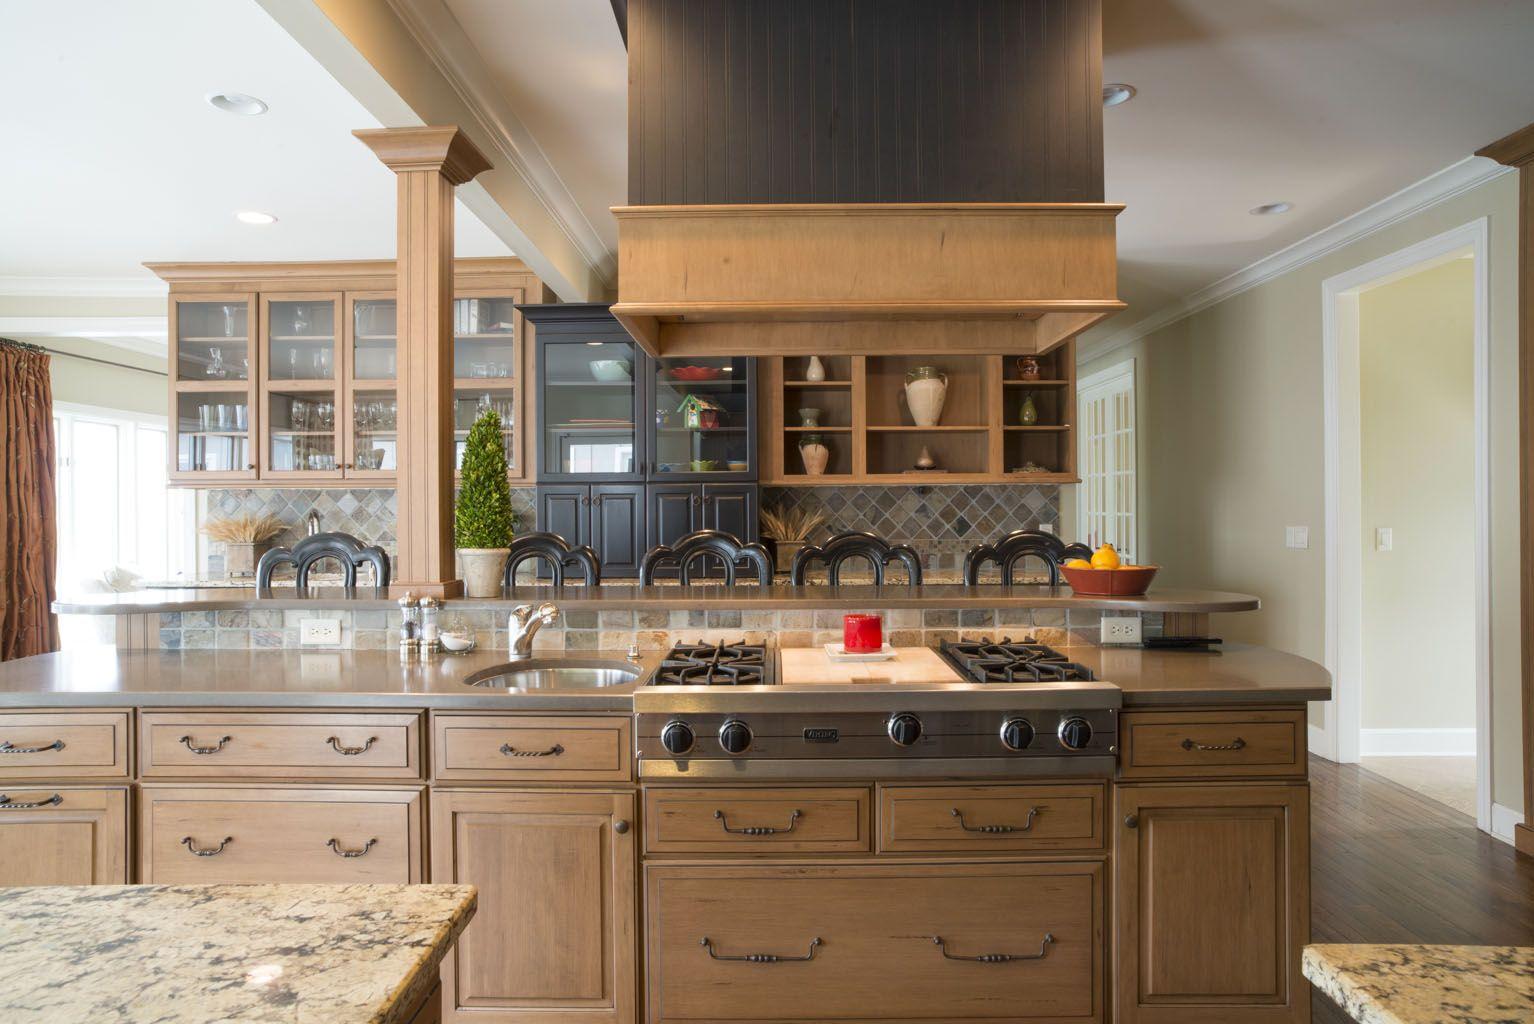 Photo By Med Dement #kitchen #granite #decor #homedecor #chattanooga #cha ·  CountertopsGraniteAppliancesCabinets